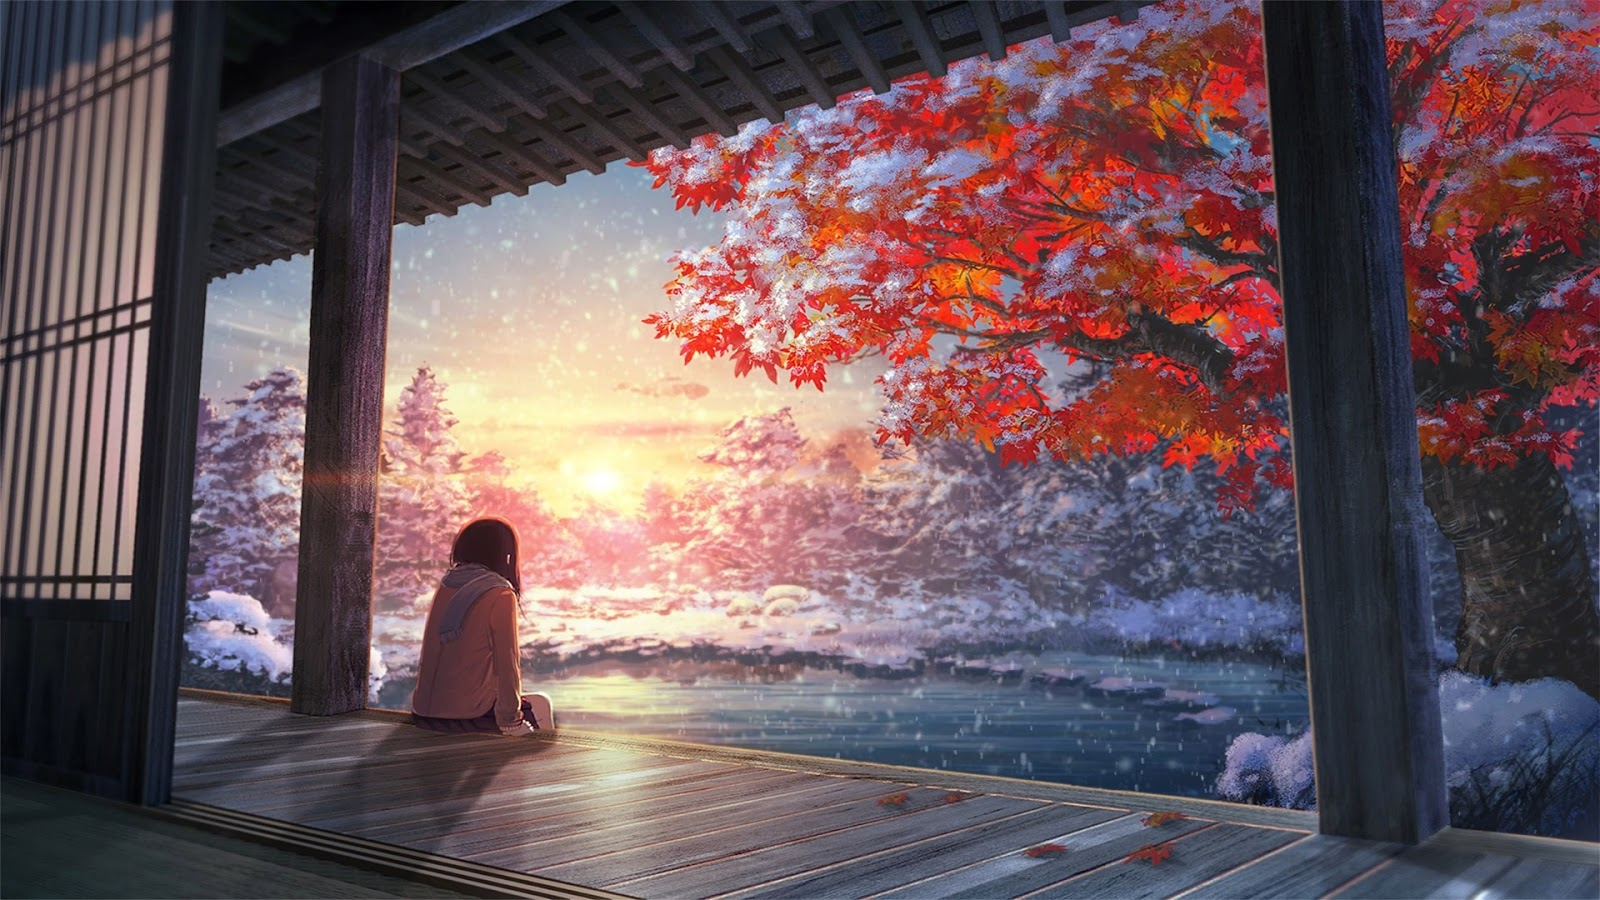 Anime Landscape 1920 x 1080